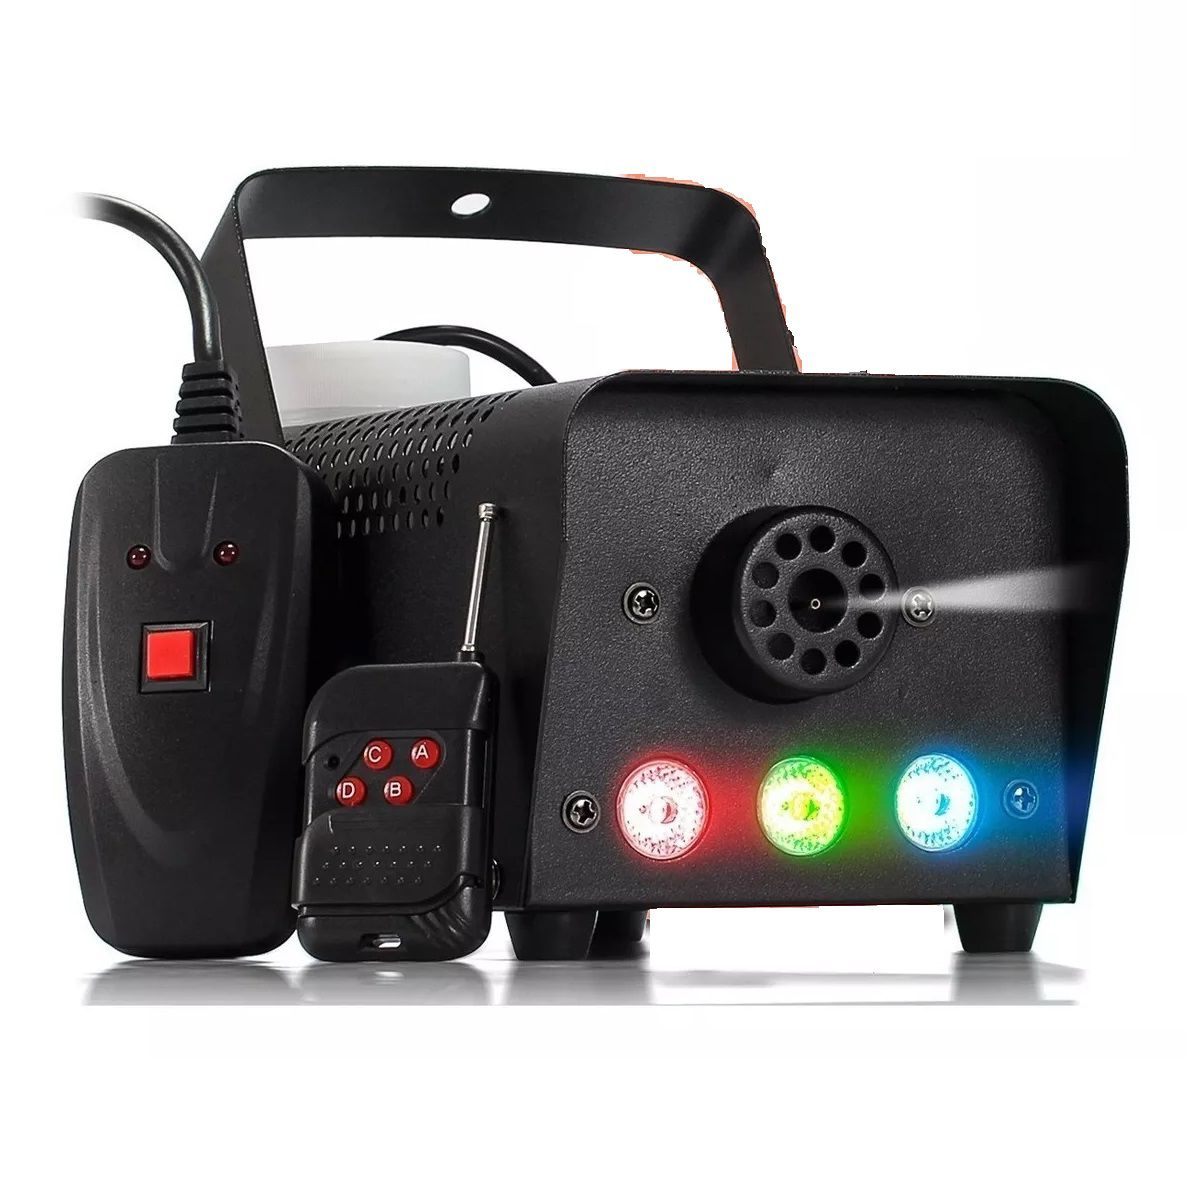 Máquina de Fumaça 600w 3 Leds 1 Watt RGB Controle Sem Fio - XH-600W - FULLFILMENT